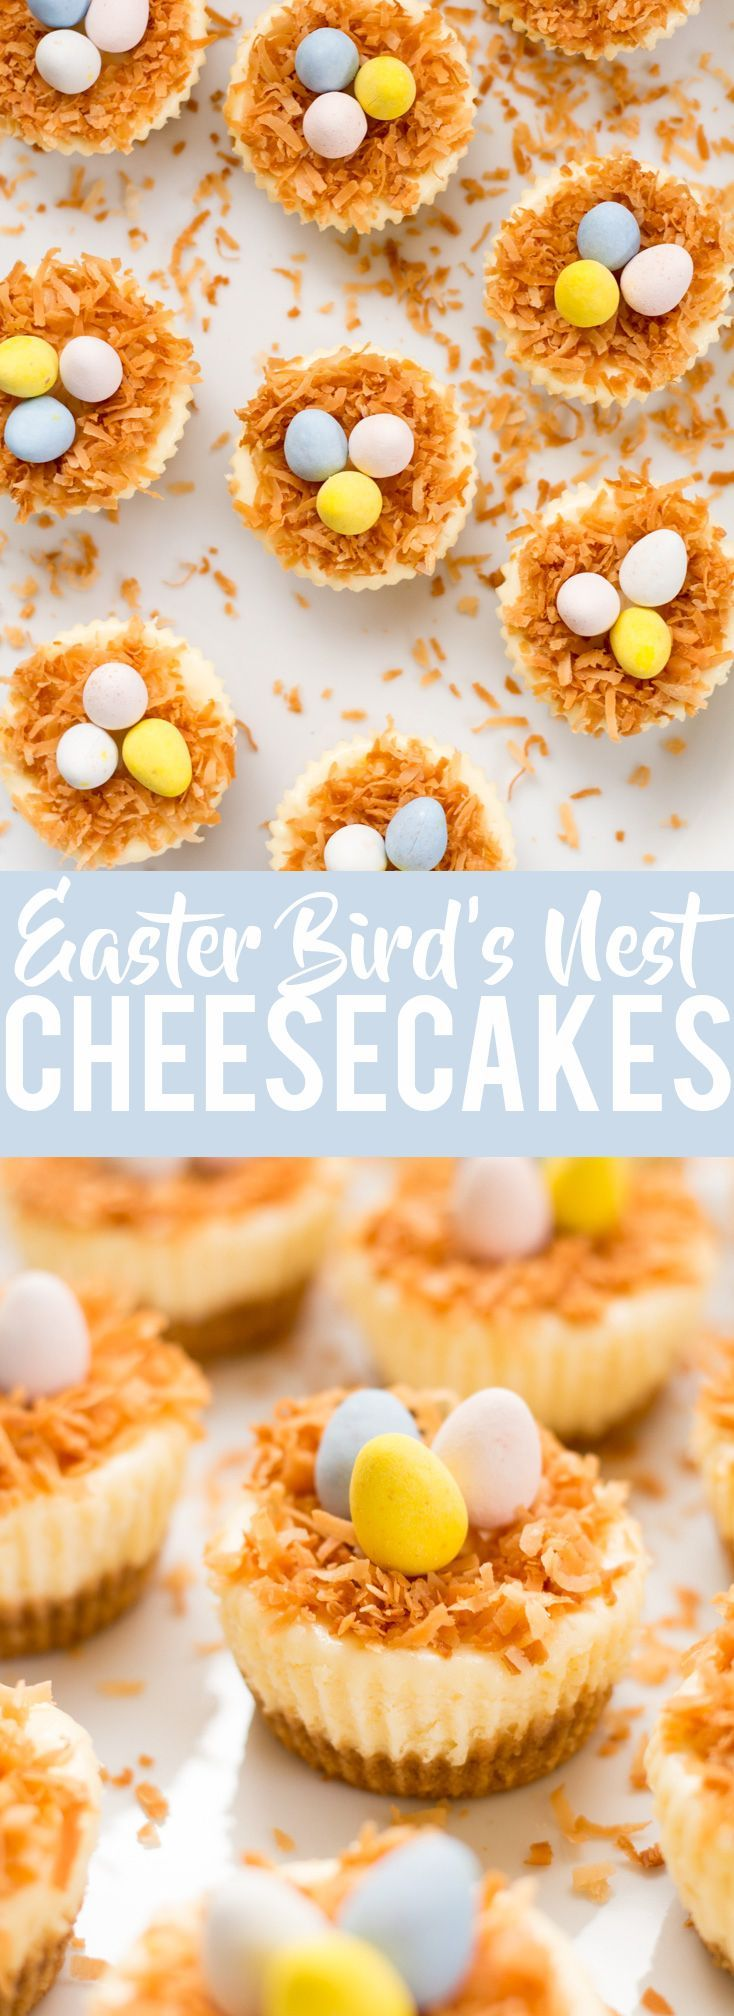 Easter Birds Nest Mini Cheesecakes   Easter Dessert   Cute Dessert   Mini Cheesecakes  mini eggs